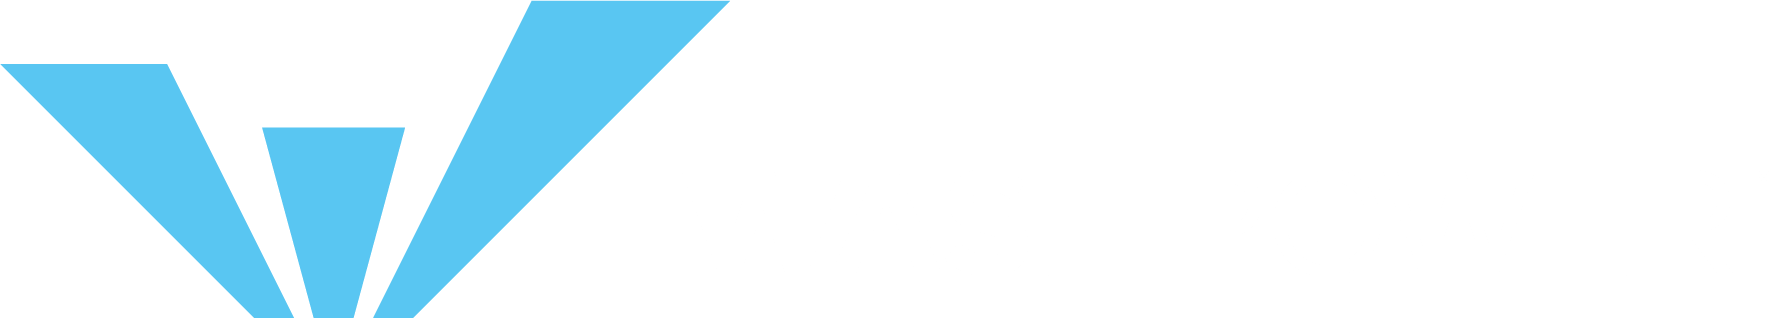 washpower-logo-hvid